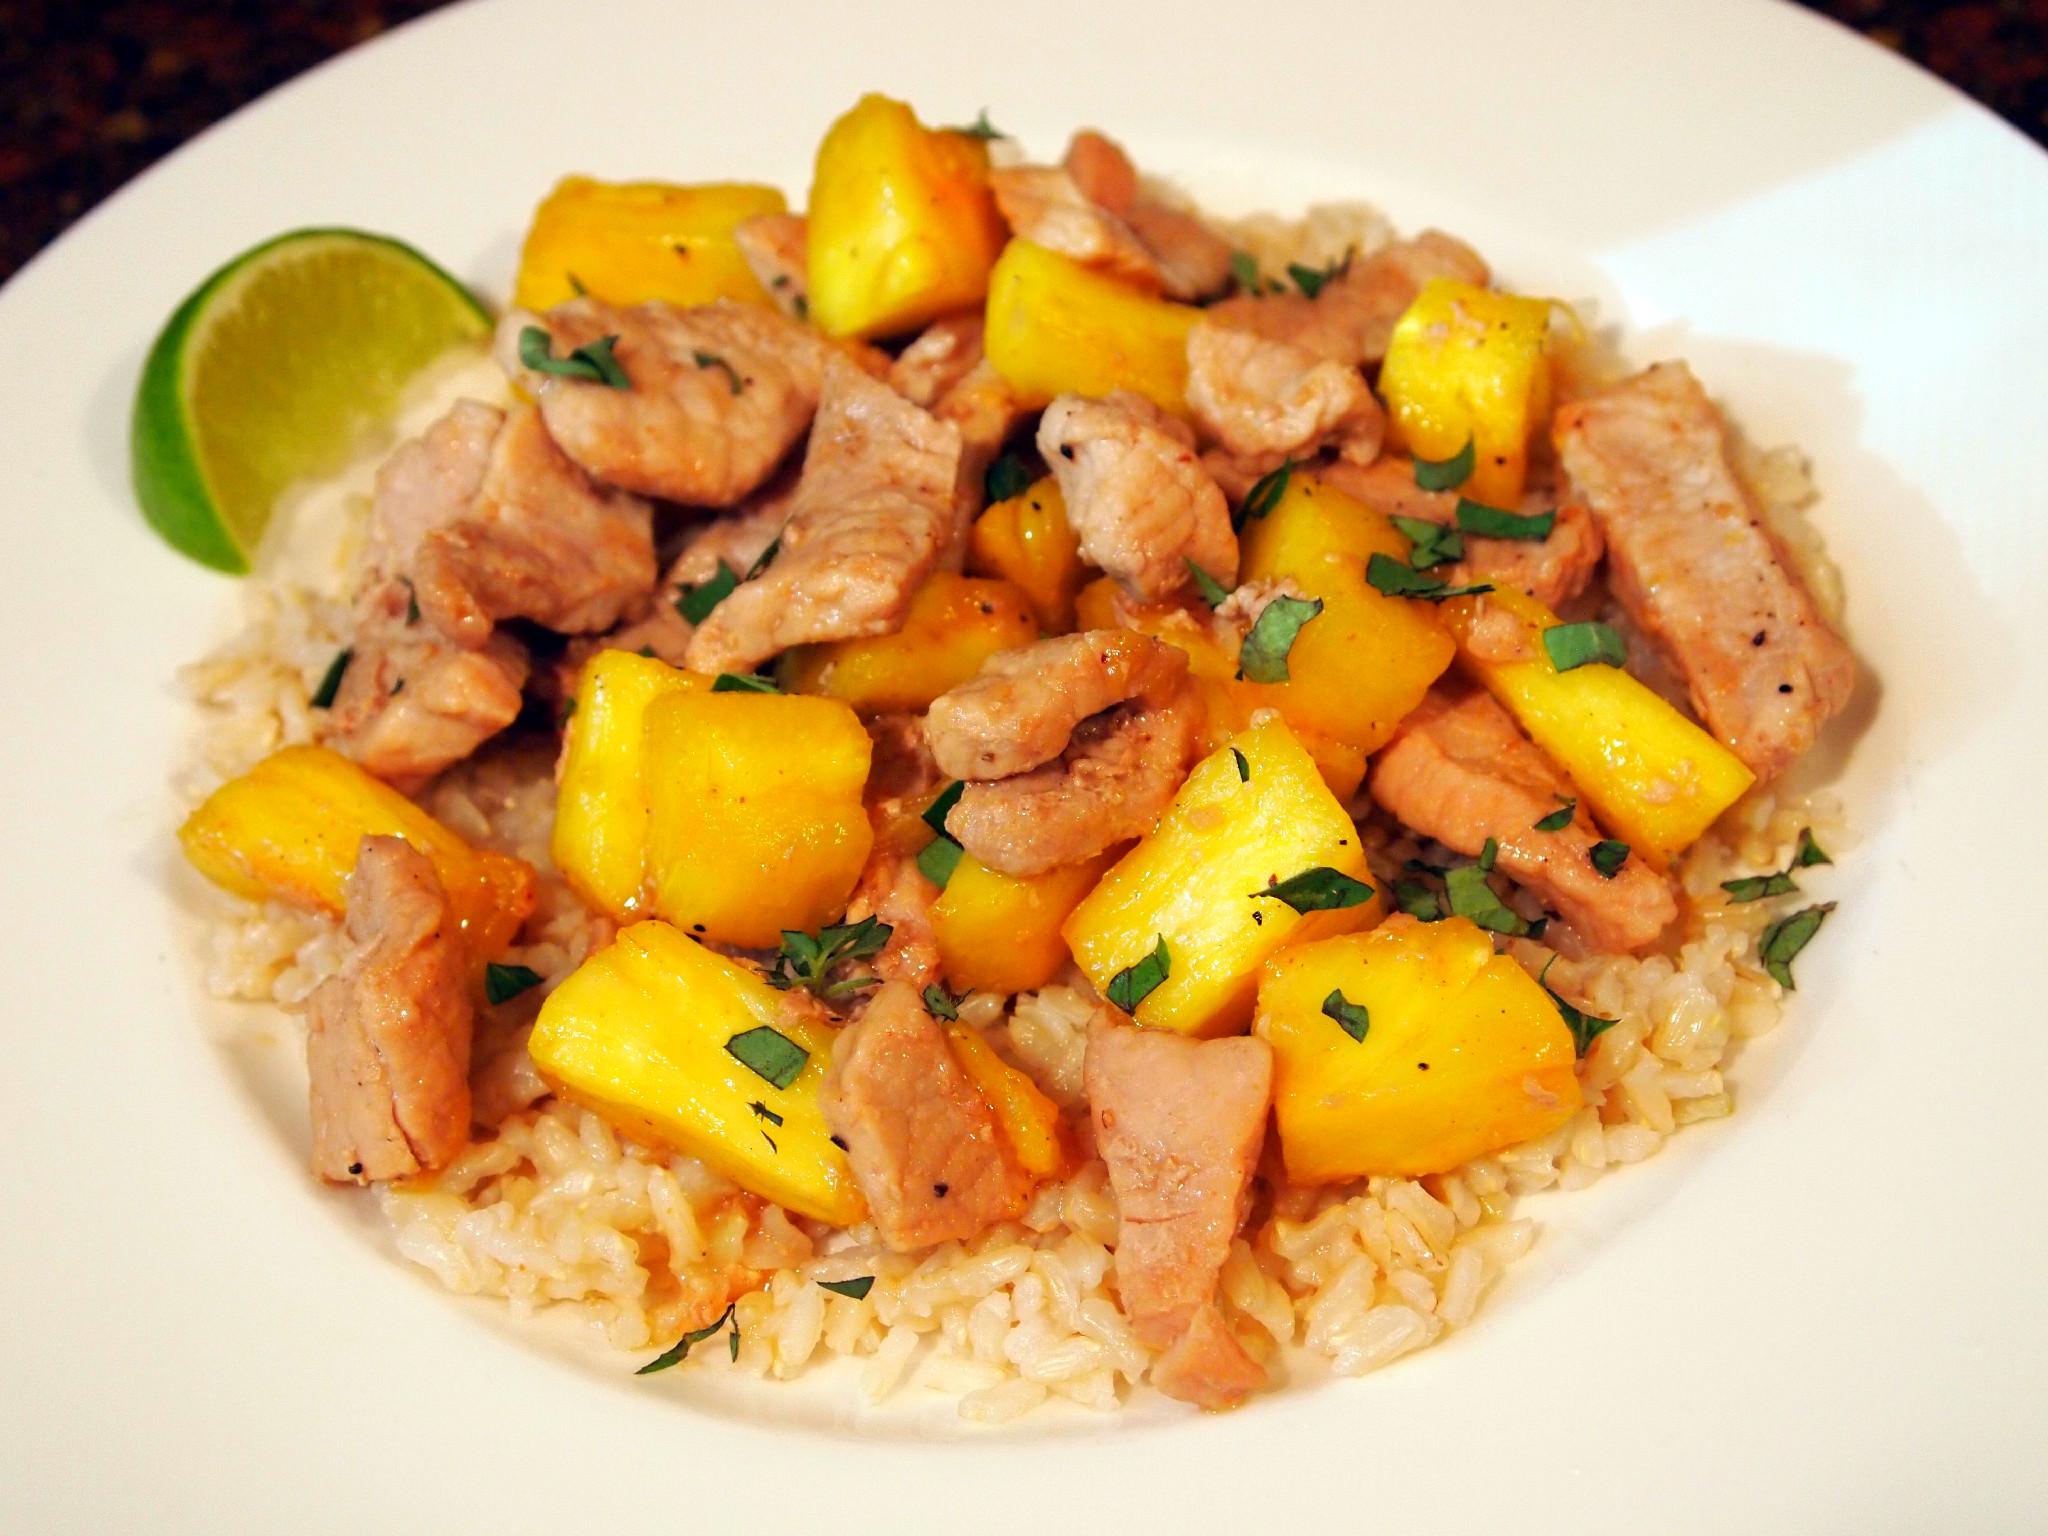 Pork and Pineapple Stir Fry